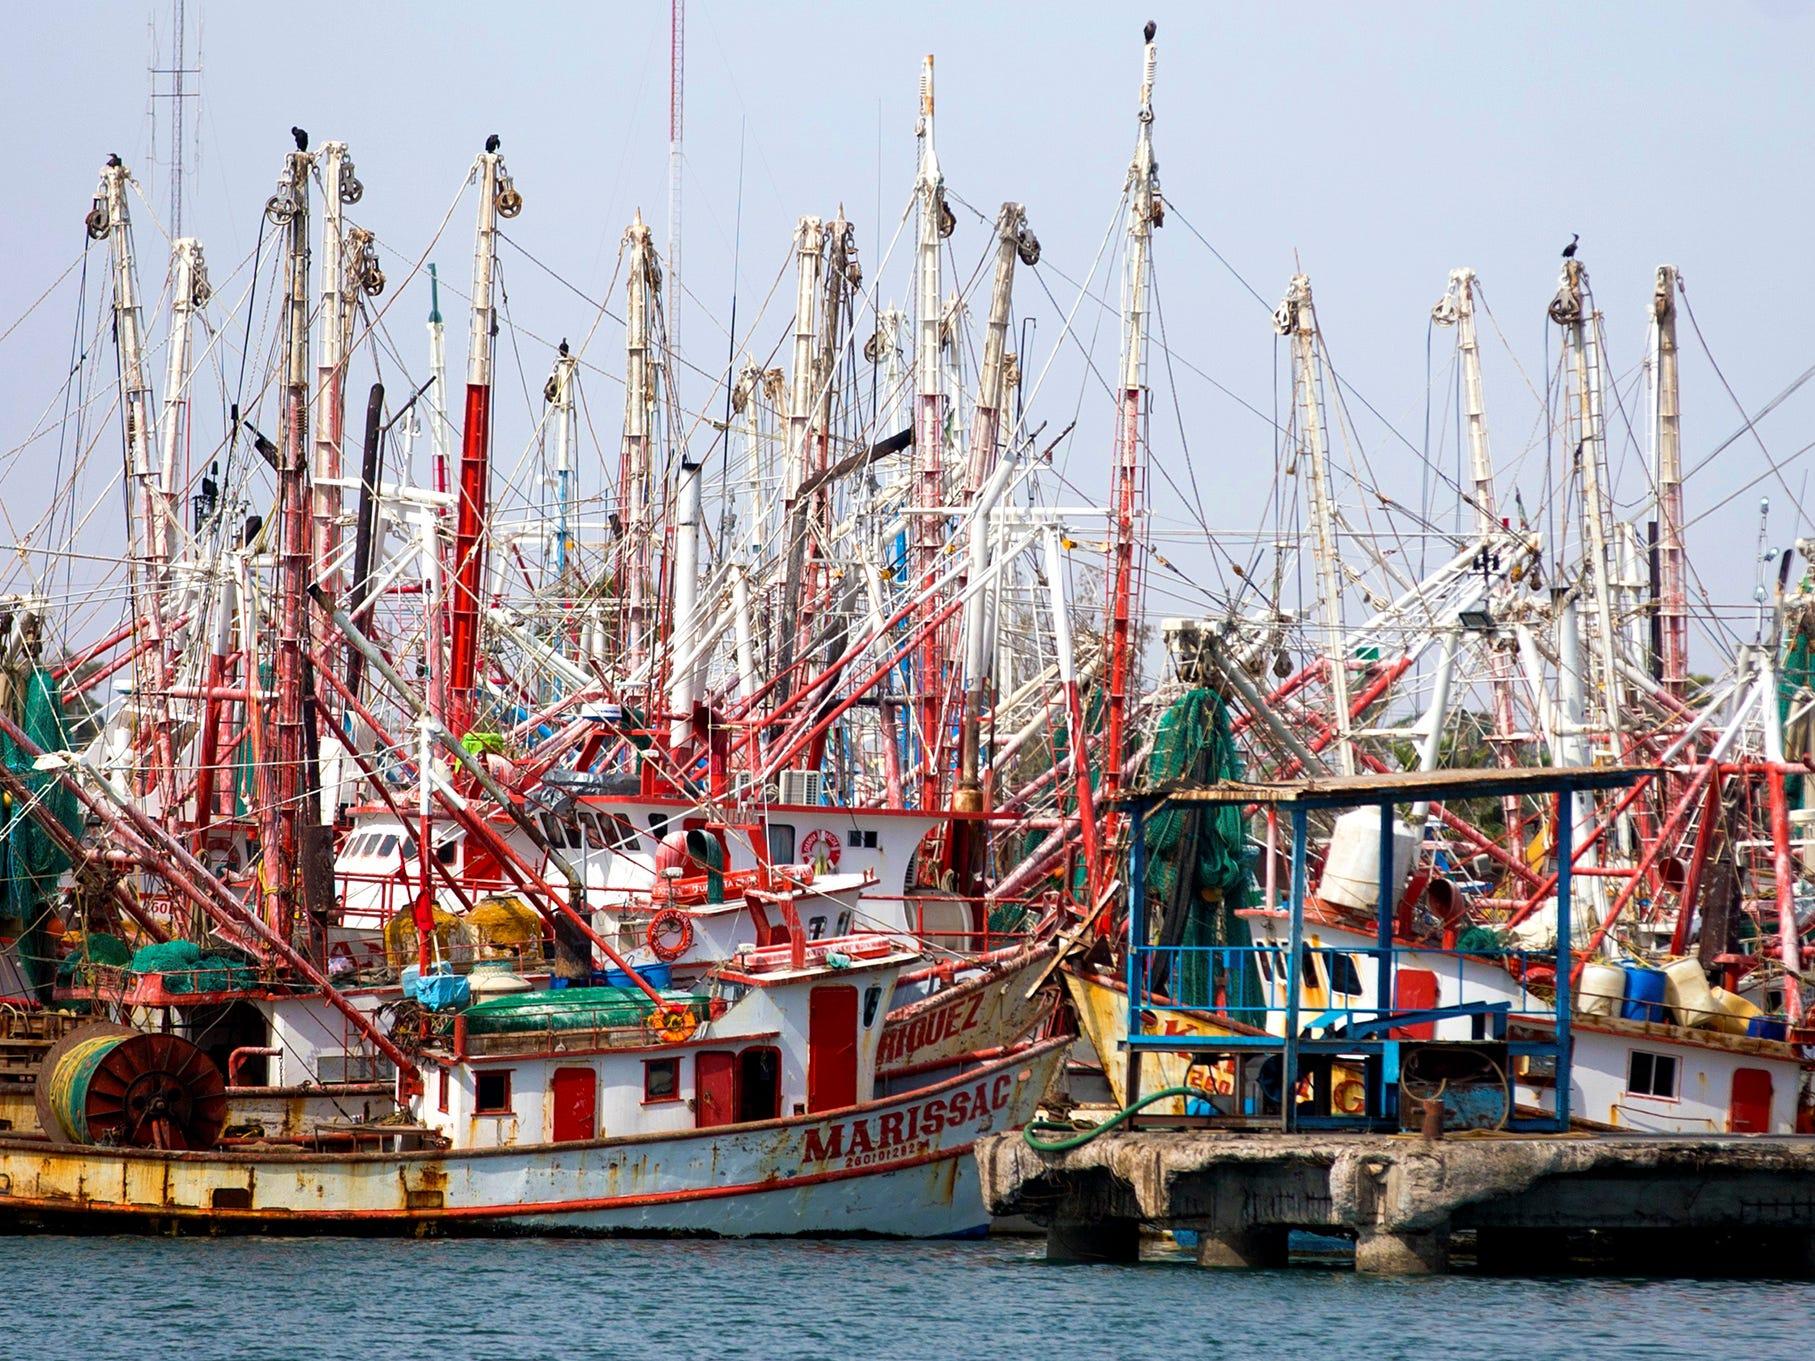 Shrimp boats are docked in Puerto Penasco, Mexico. Shrimp season is from September to mid-April.